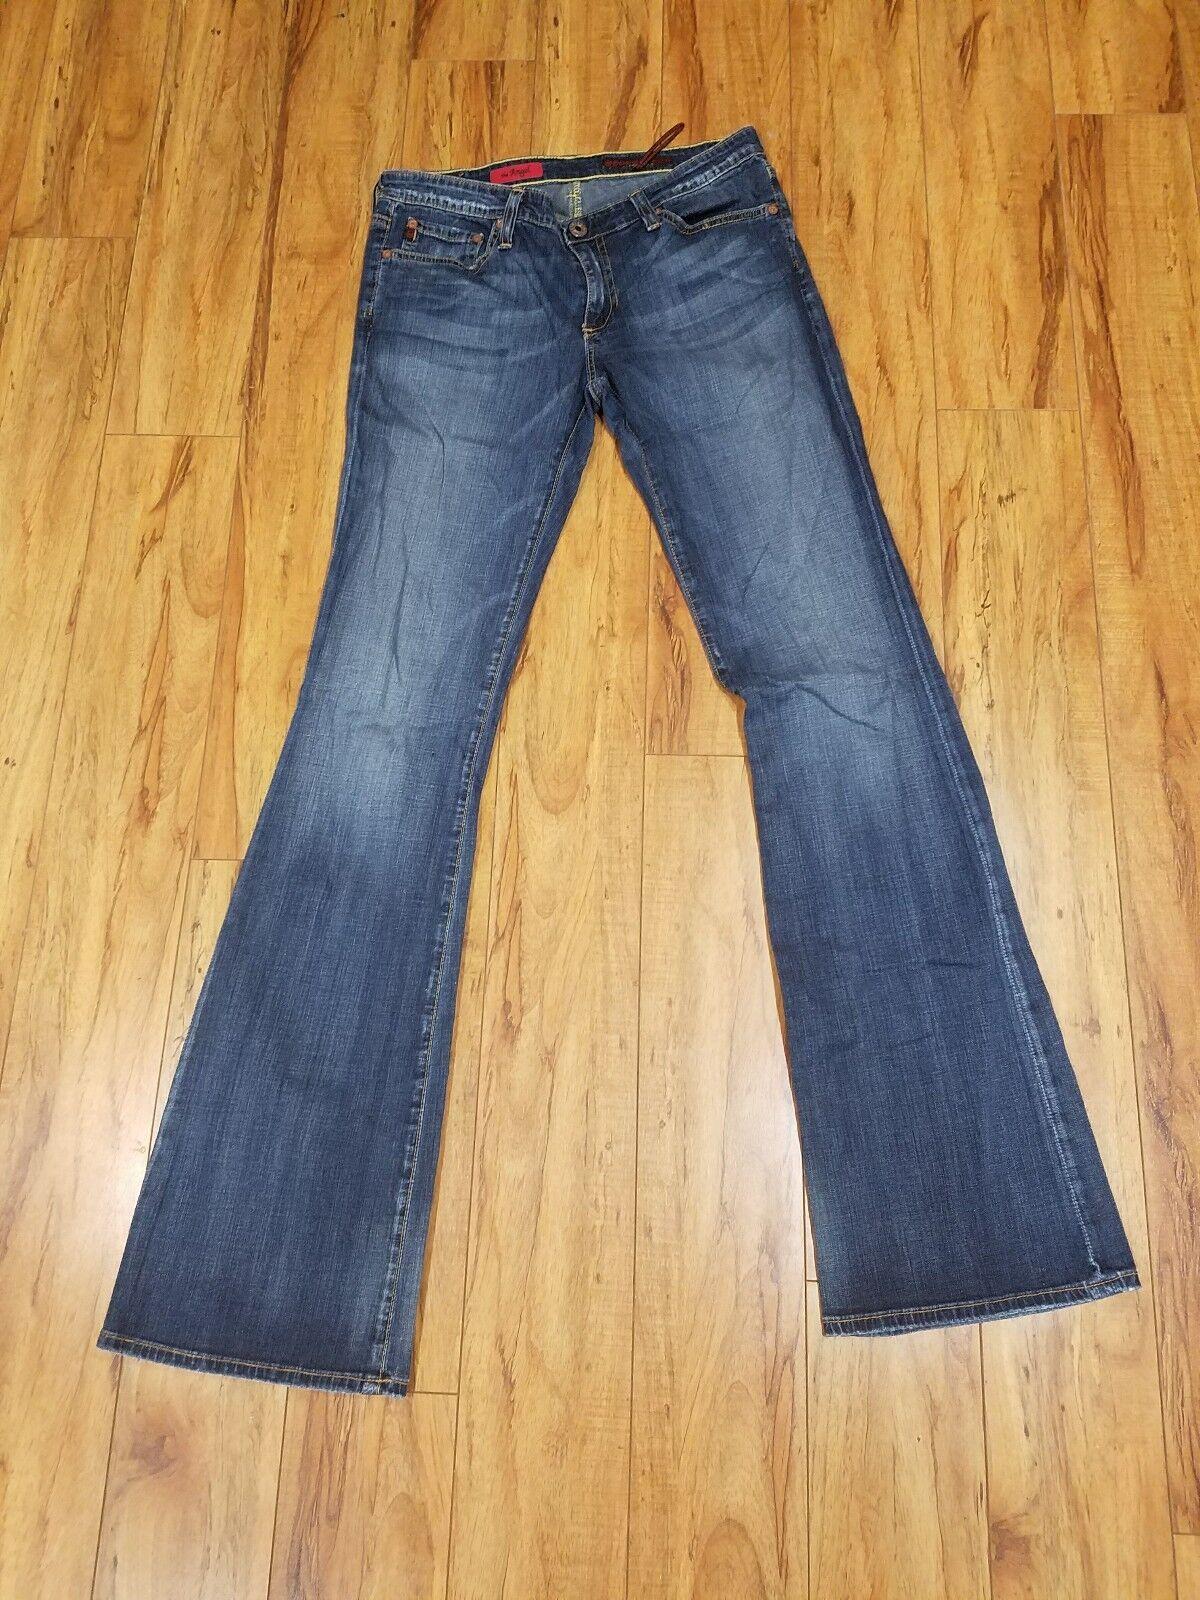 AG Adriano goldschmied The Angel Denim Straight Leg Regular Jeans Women Size 28R